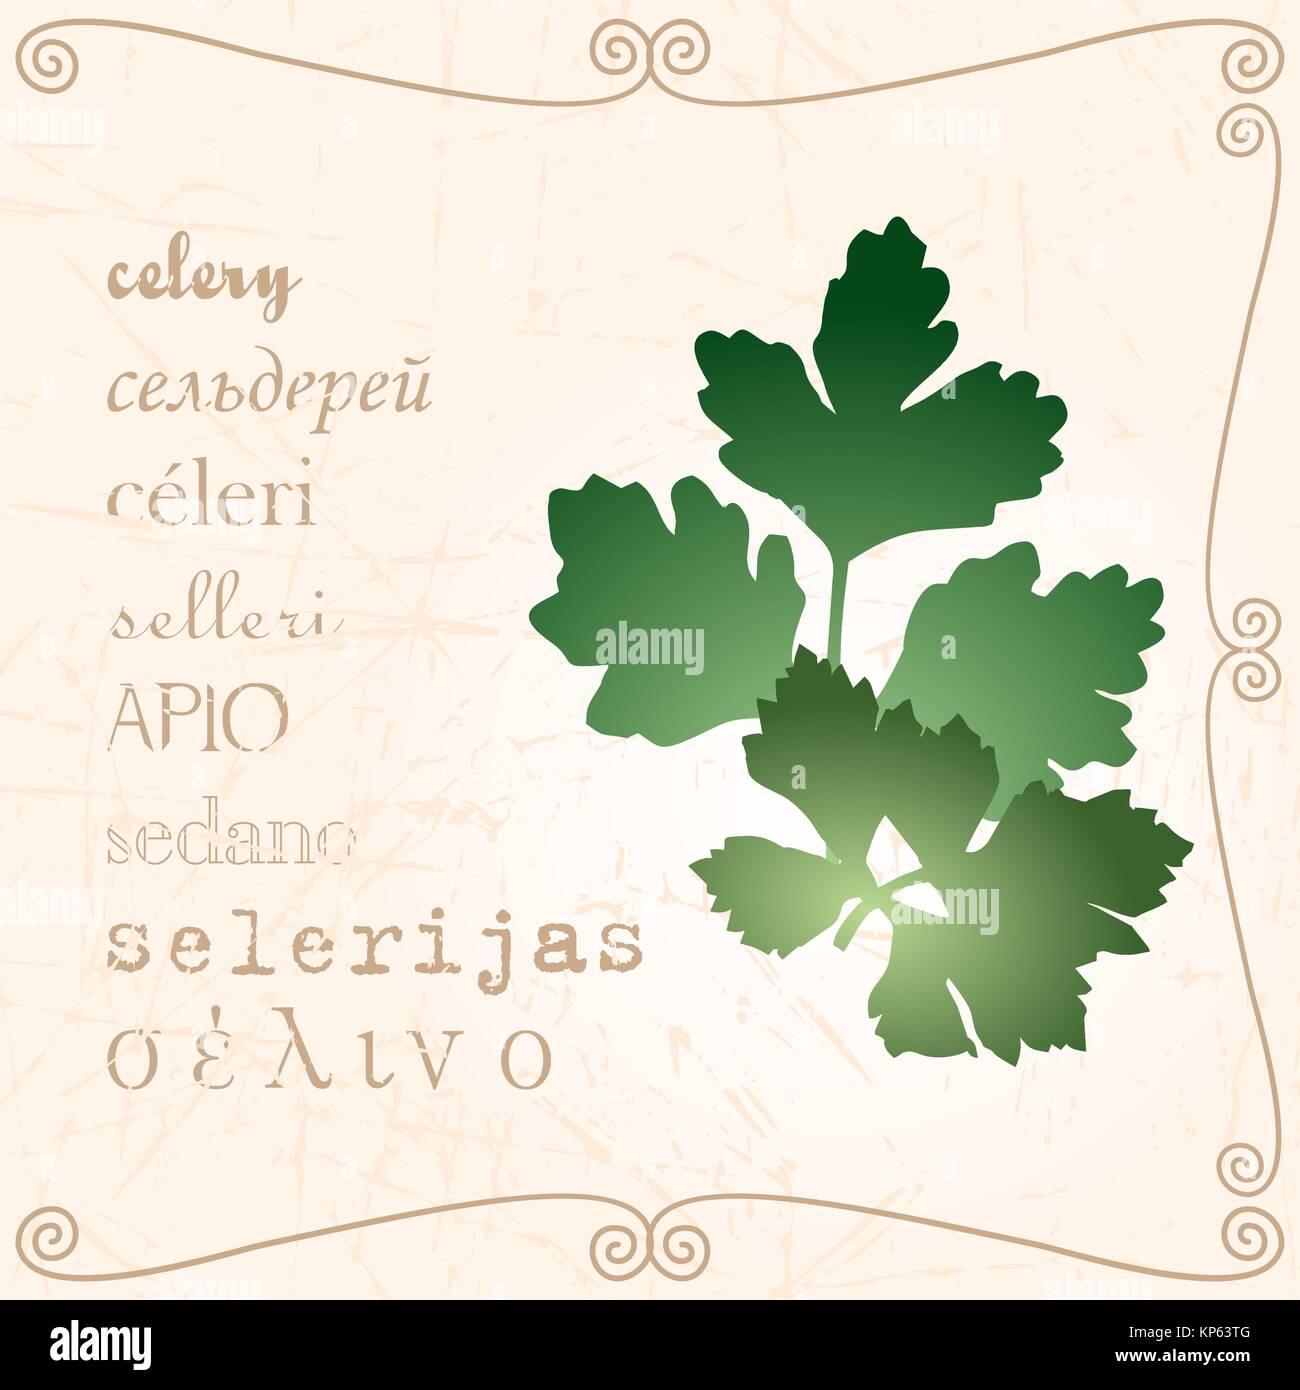 Sprig of celery in vintage style - Stock Vector